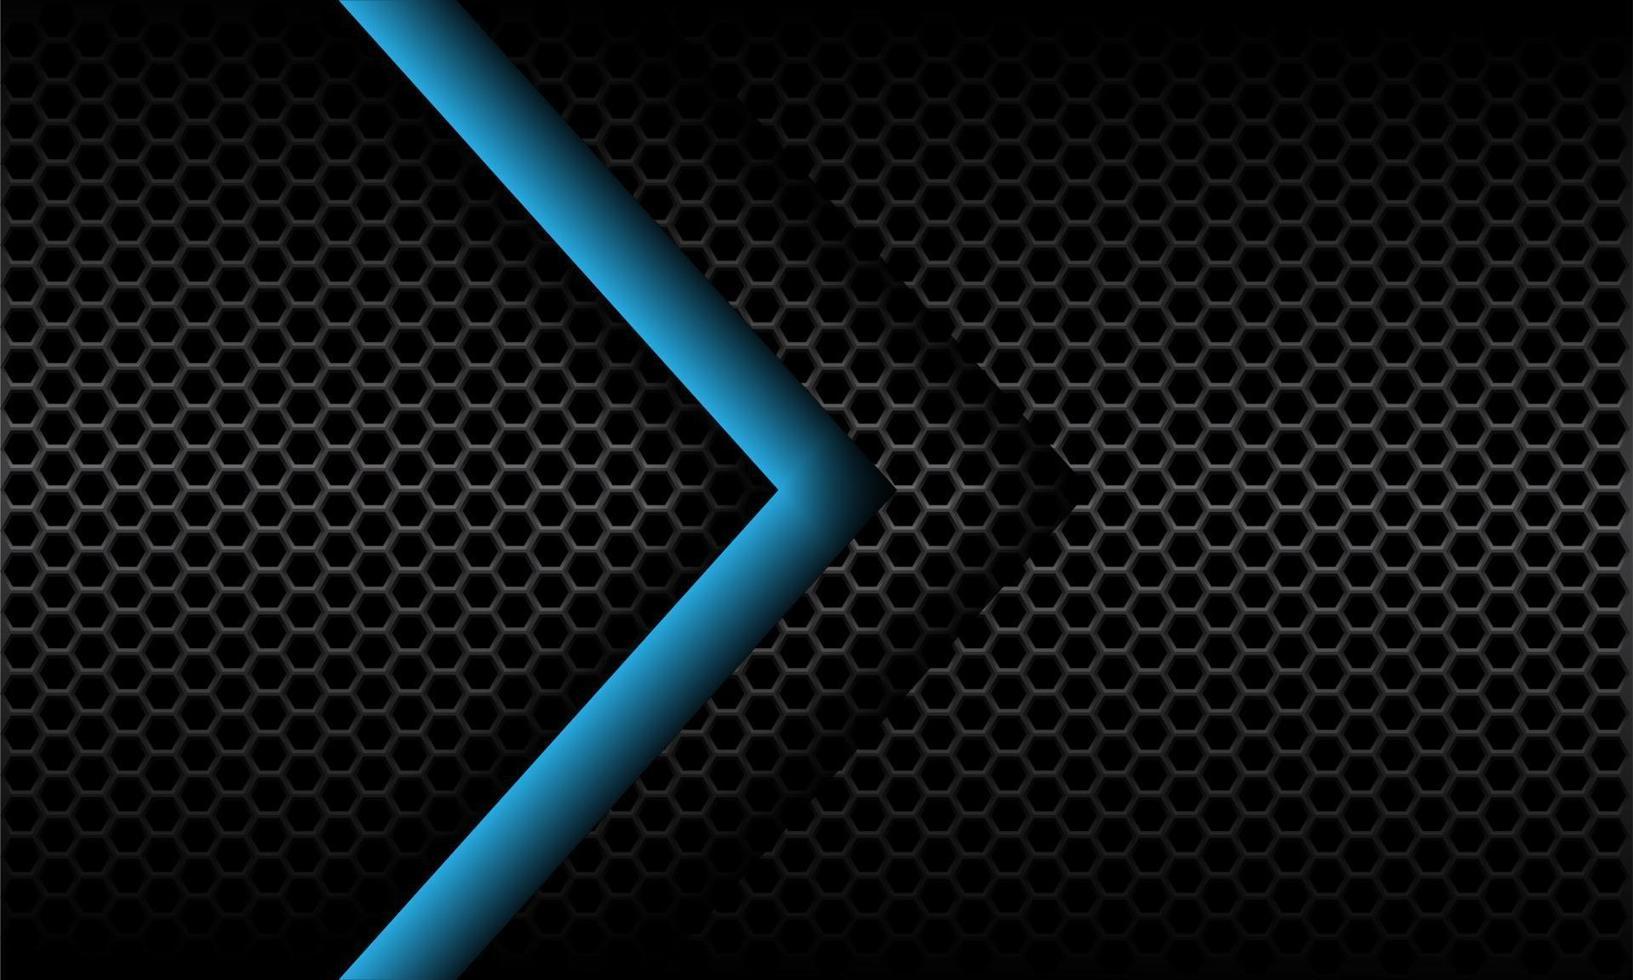 abstrakt blå pilriktning på mörkgrå metallisk hexagon mesh mönster design modern futuristisk bakgrund vektorillustration. vektor